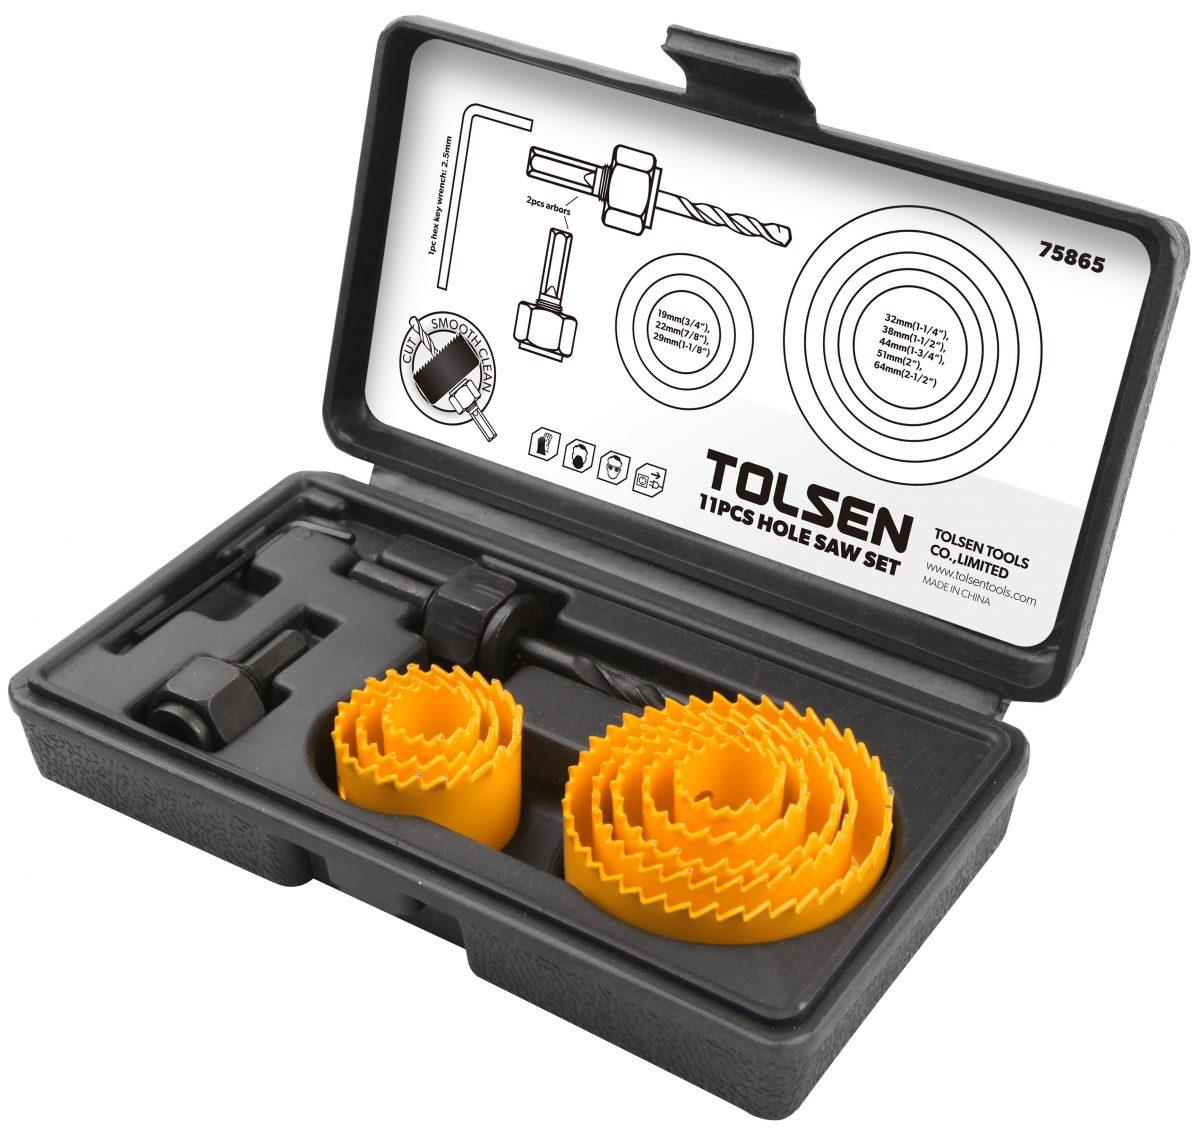 Hole saw-plastic-wood-11pcs-kit-downlight-plastic-75865